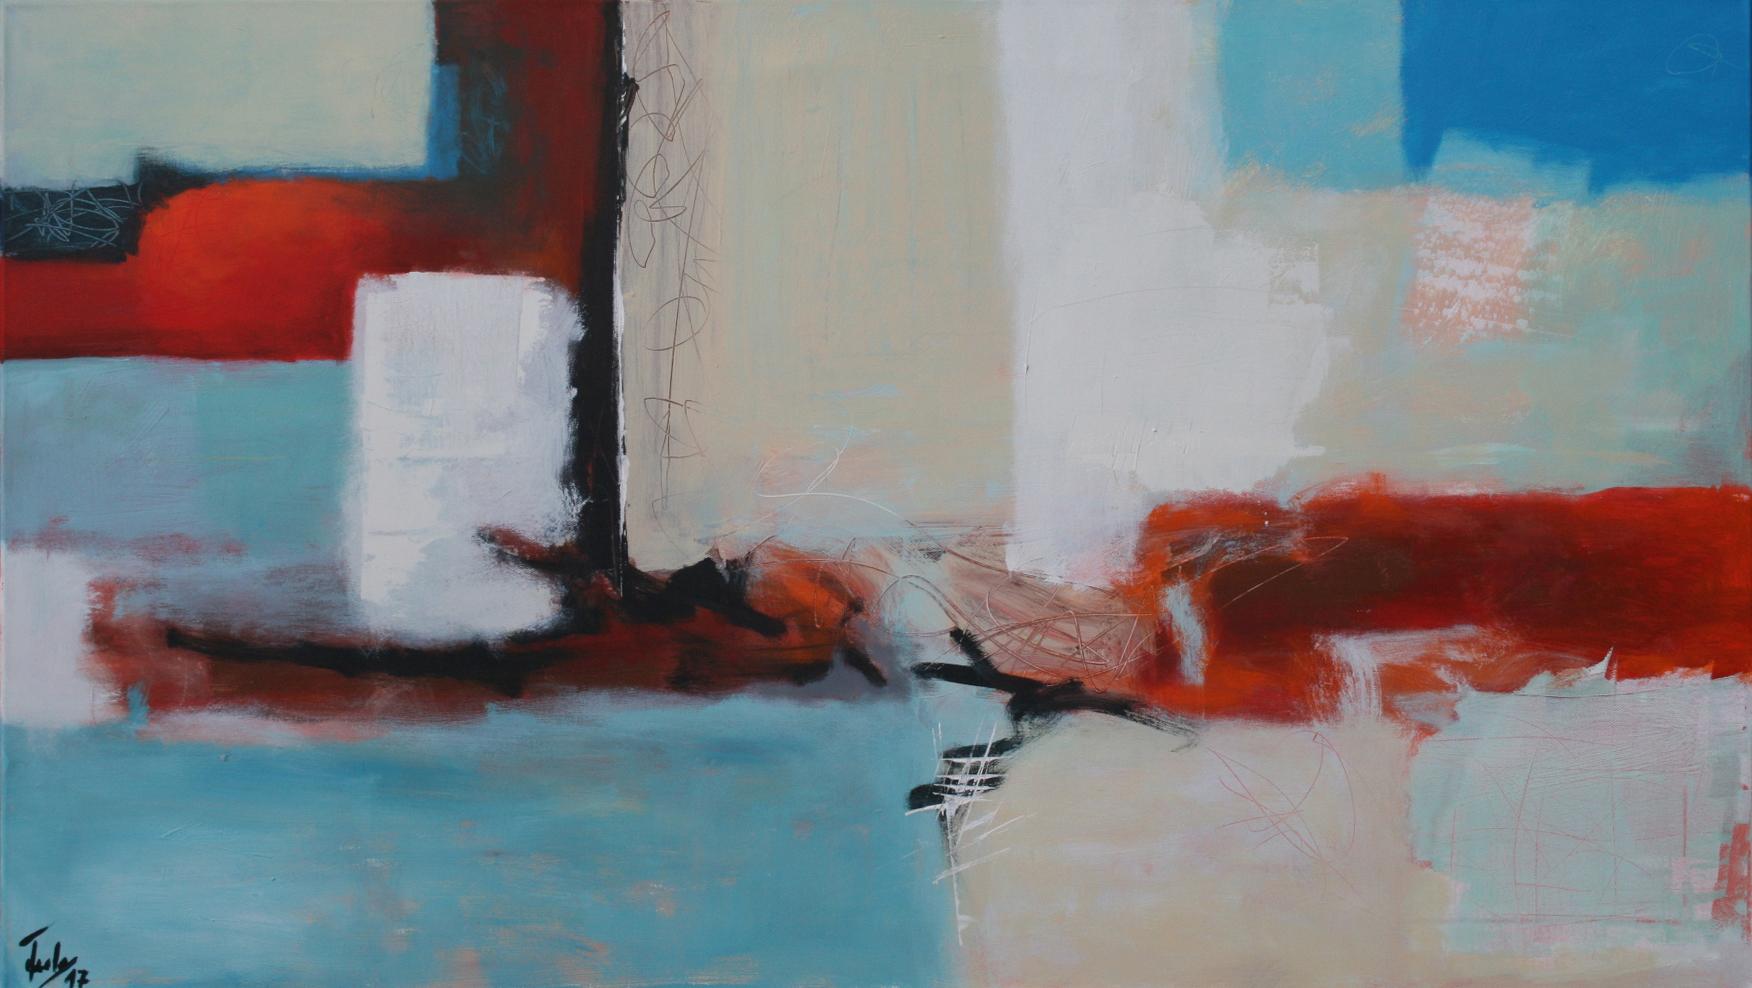 Ohne Titel , Öl und Acryl auf Leinwand, 80 x 140 cm